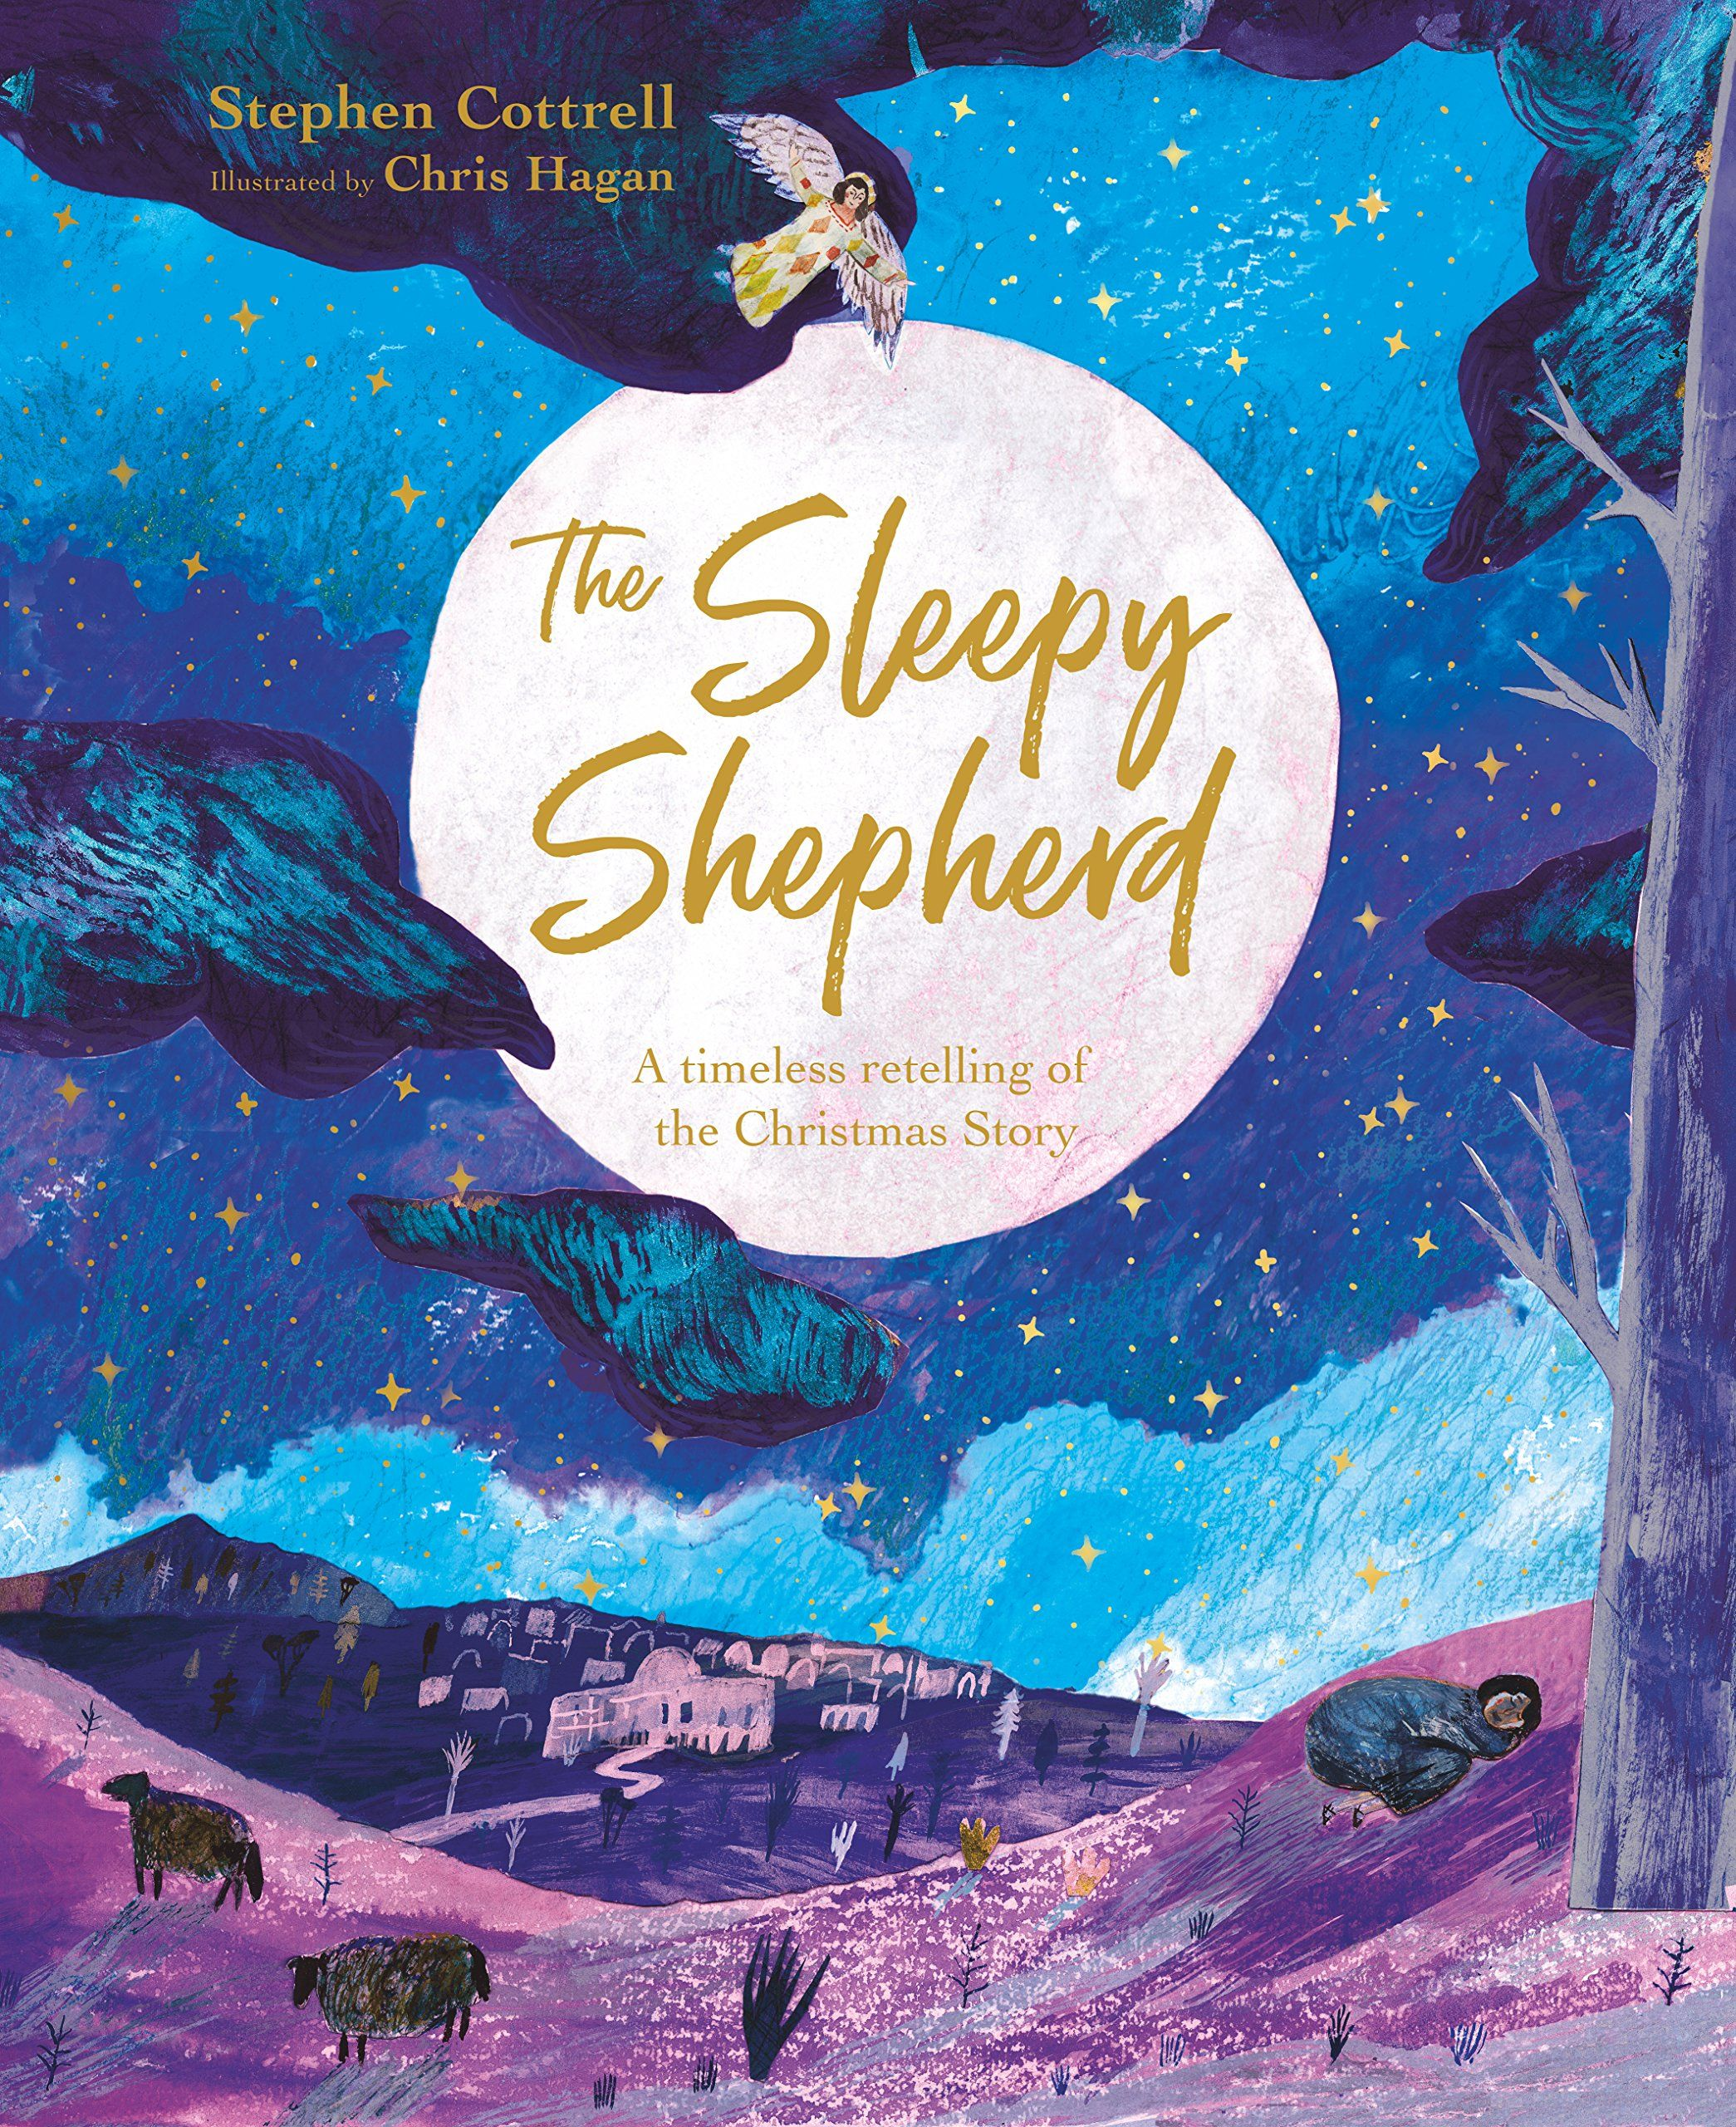 The Sleepy Shepherd is so dozy he completely misses the